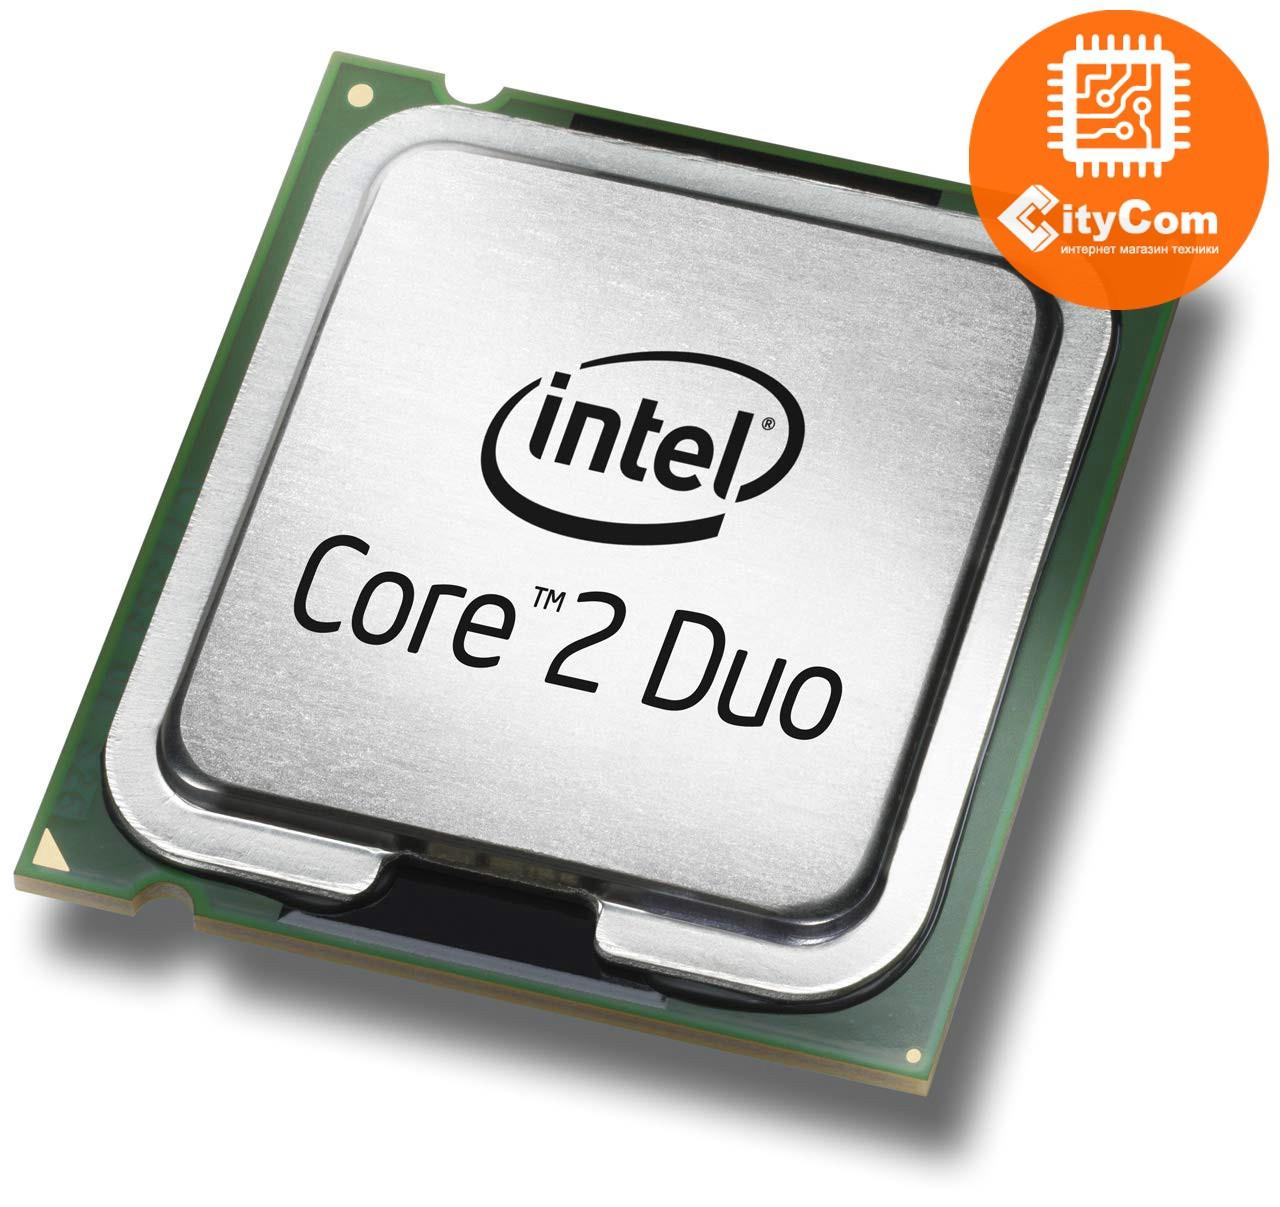 CPU S-775 Intel Core2Duo E6400 2.13 GHz (2MB, 1066 MHz, LGA775) oem Арт.1364